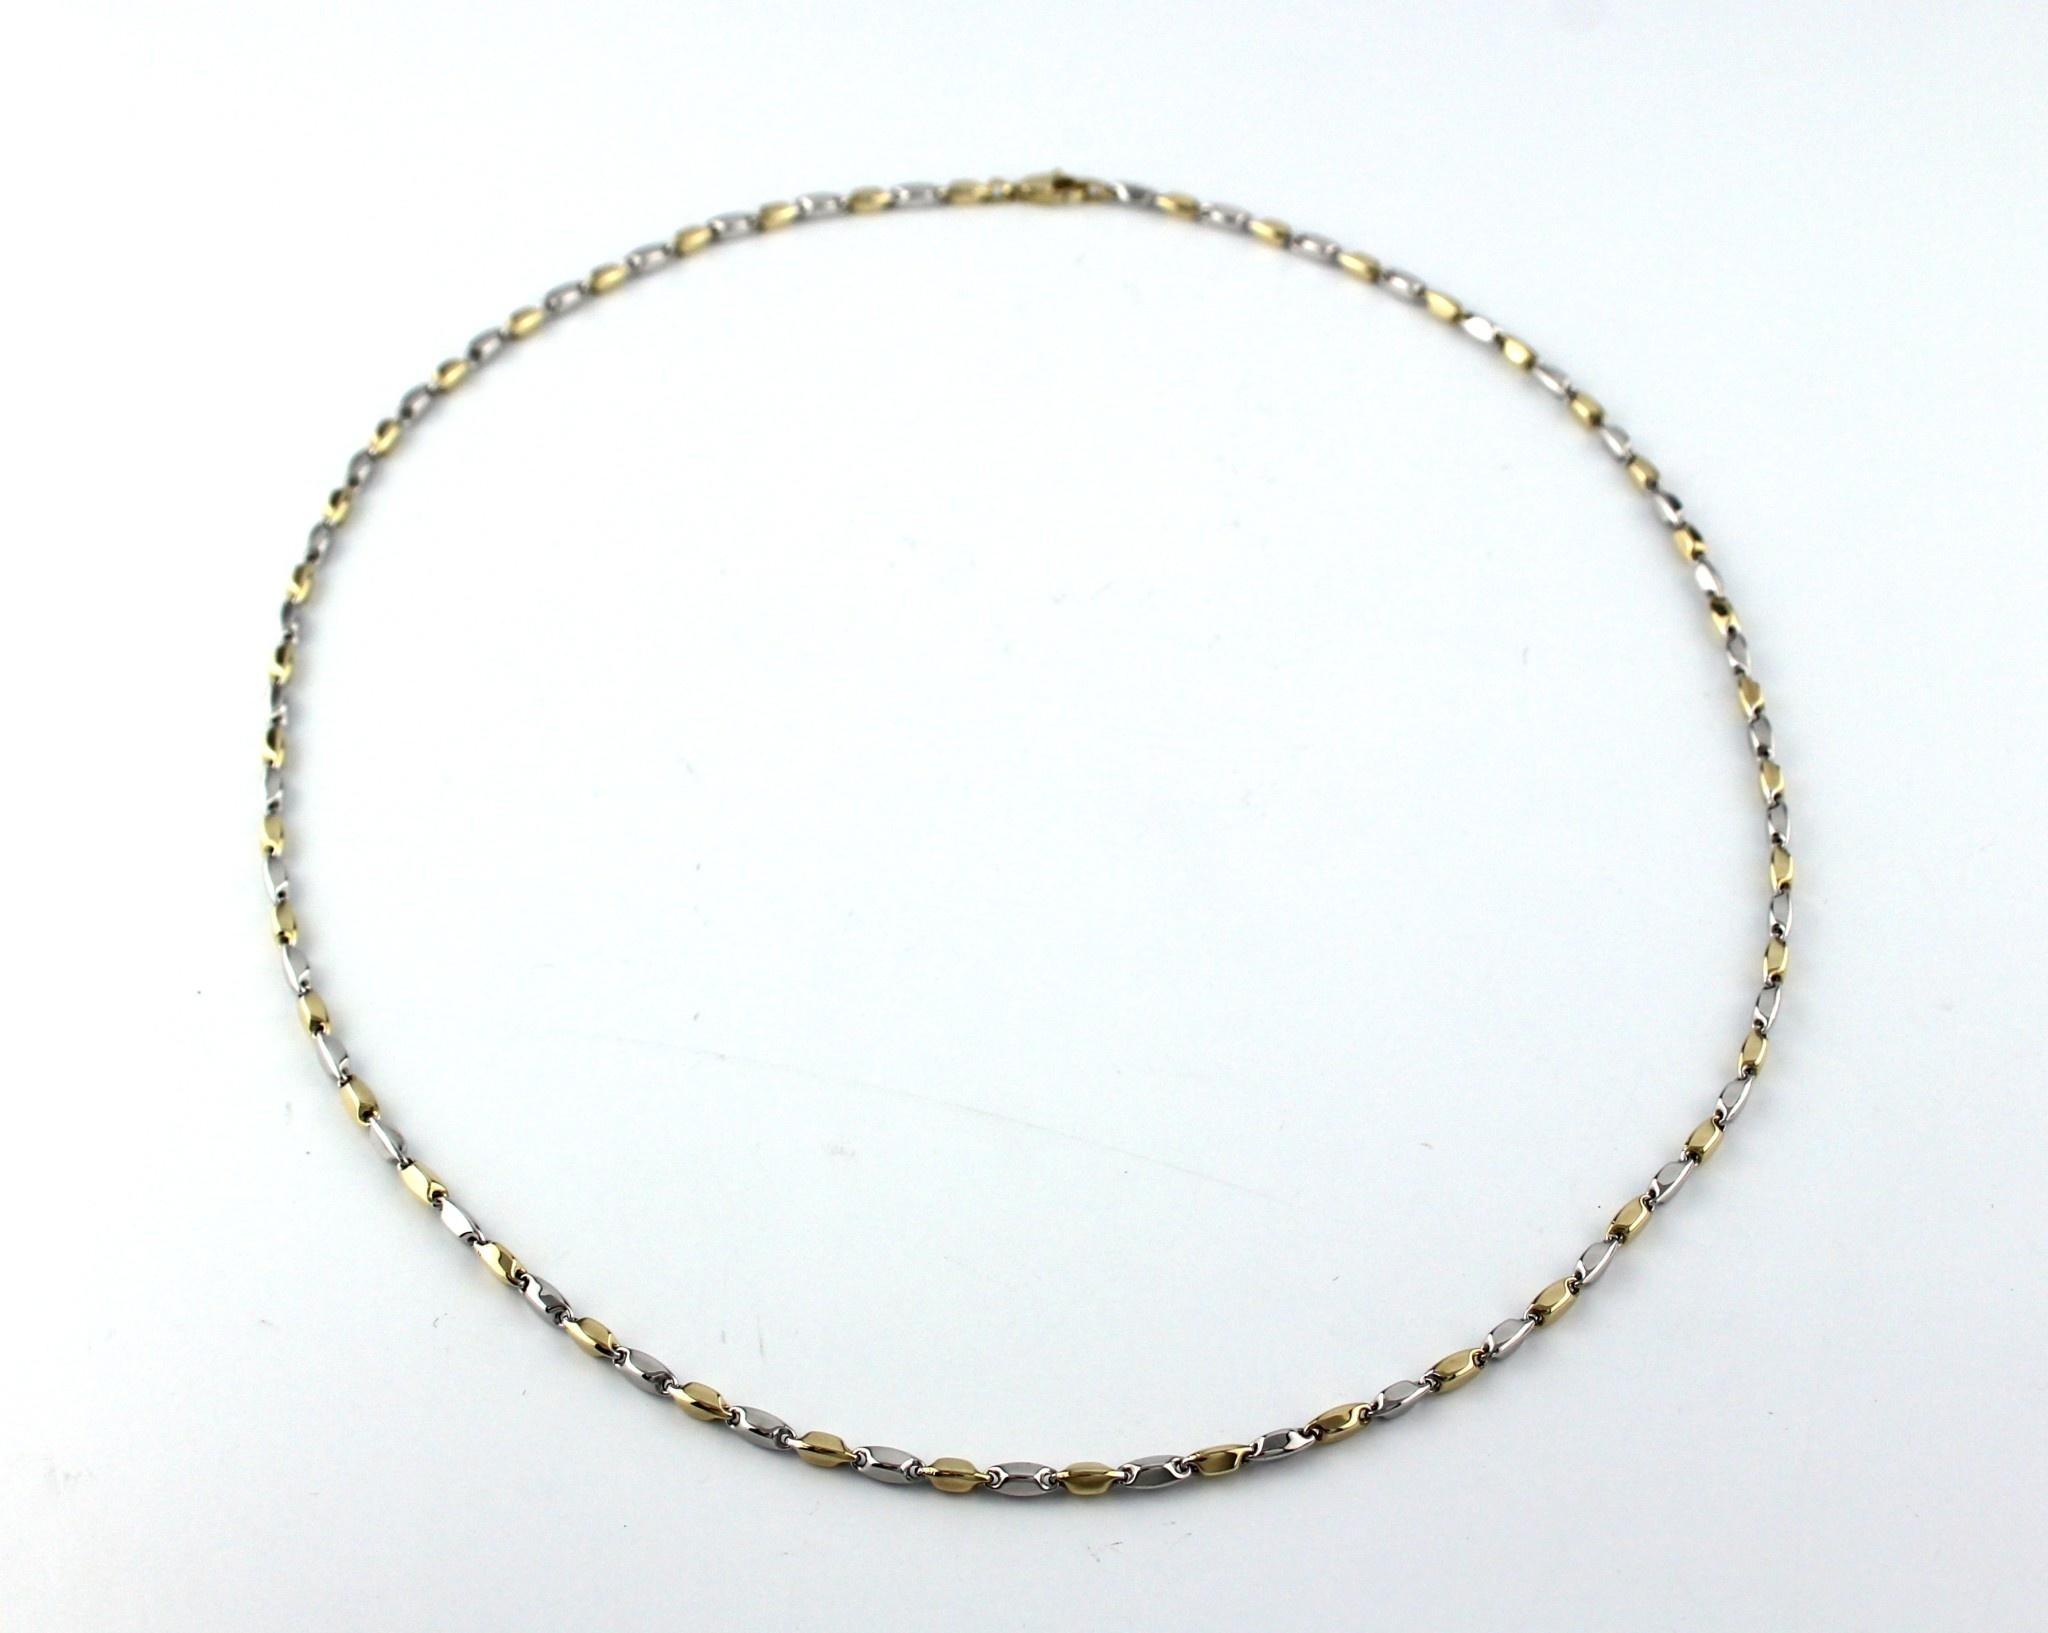 Tomylo Tomylo collier Elegance 45 cm